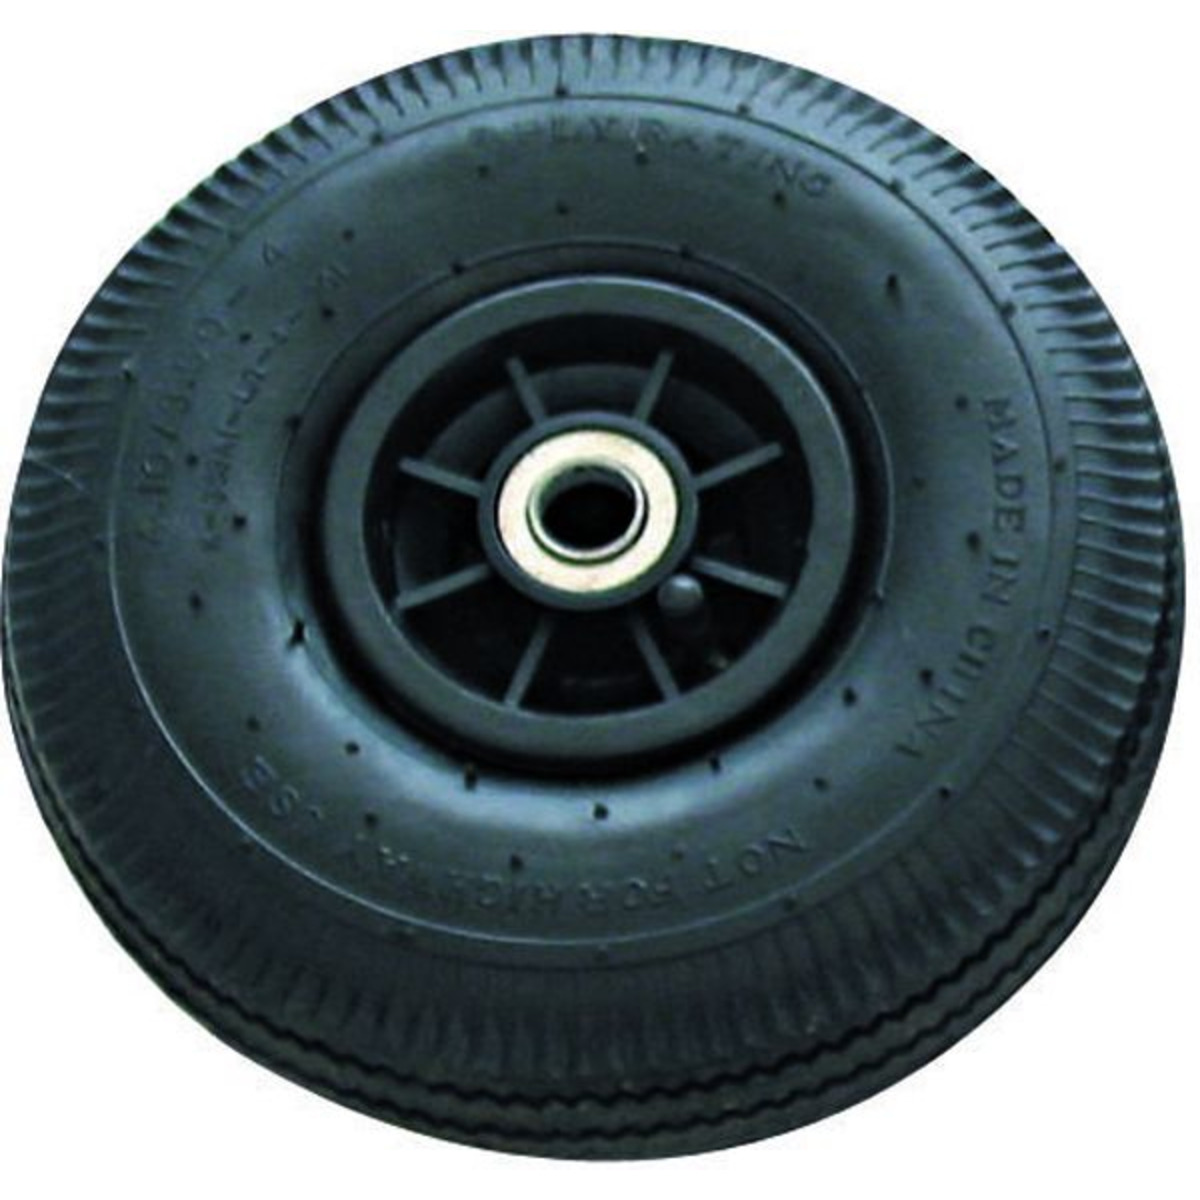 Carp Spirit Session Barrow Wheel - 1.10 kg